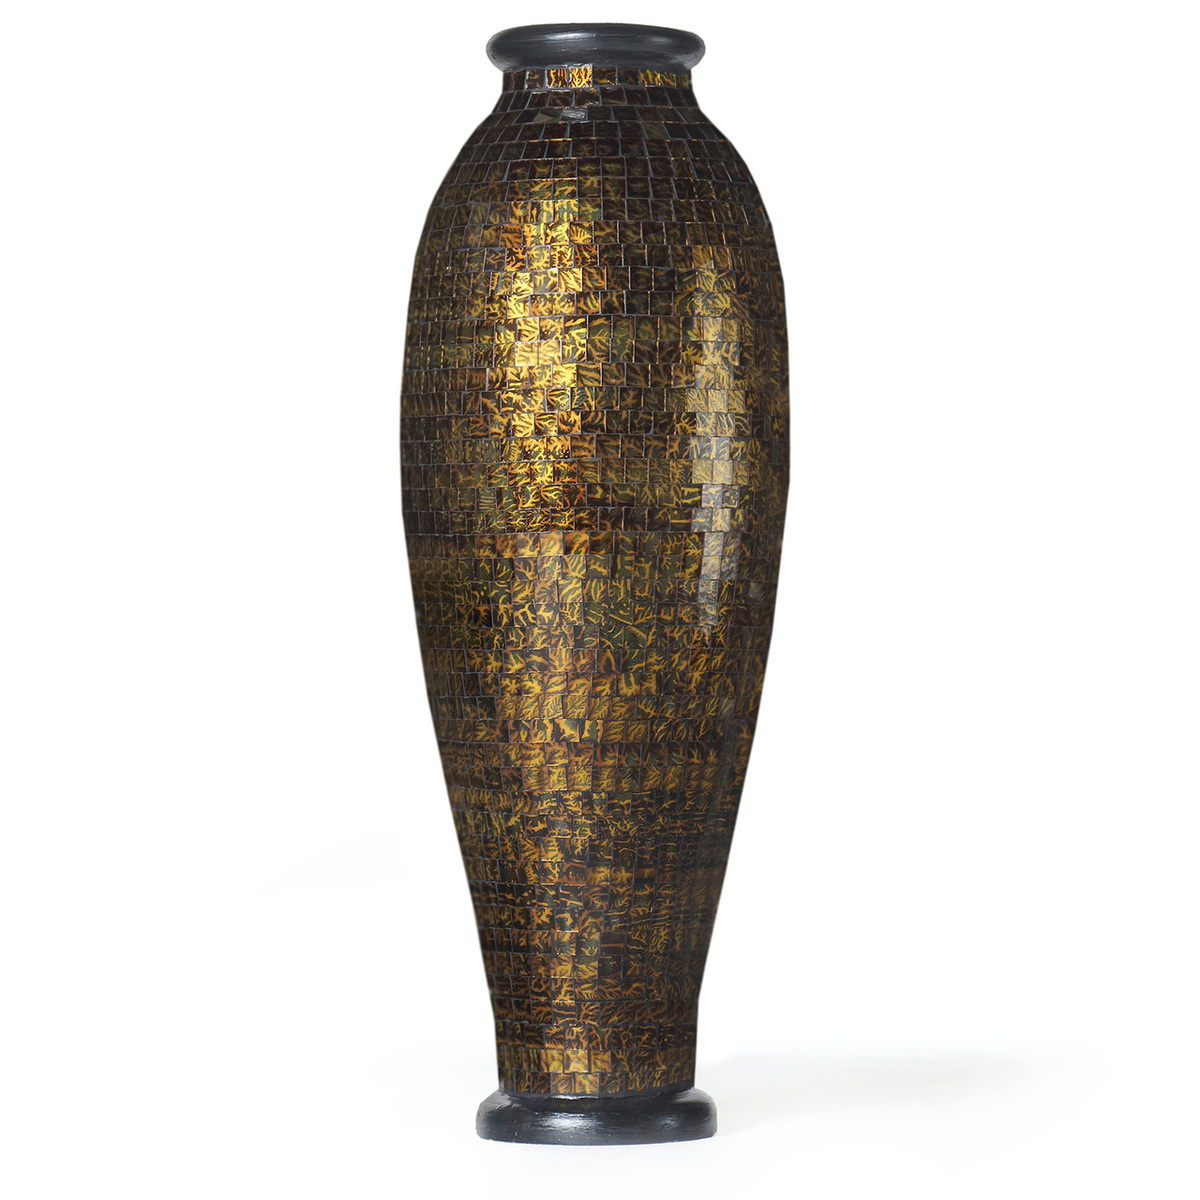 Golden_dawn_mosaic_floor_vase__82178.1458586948.1280.1280